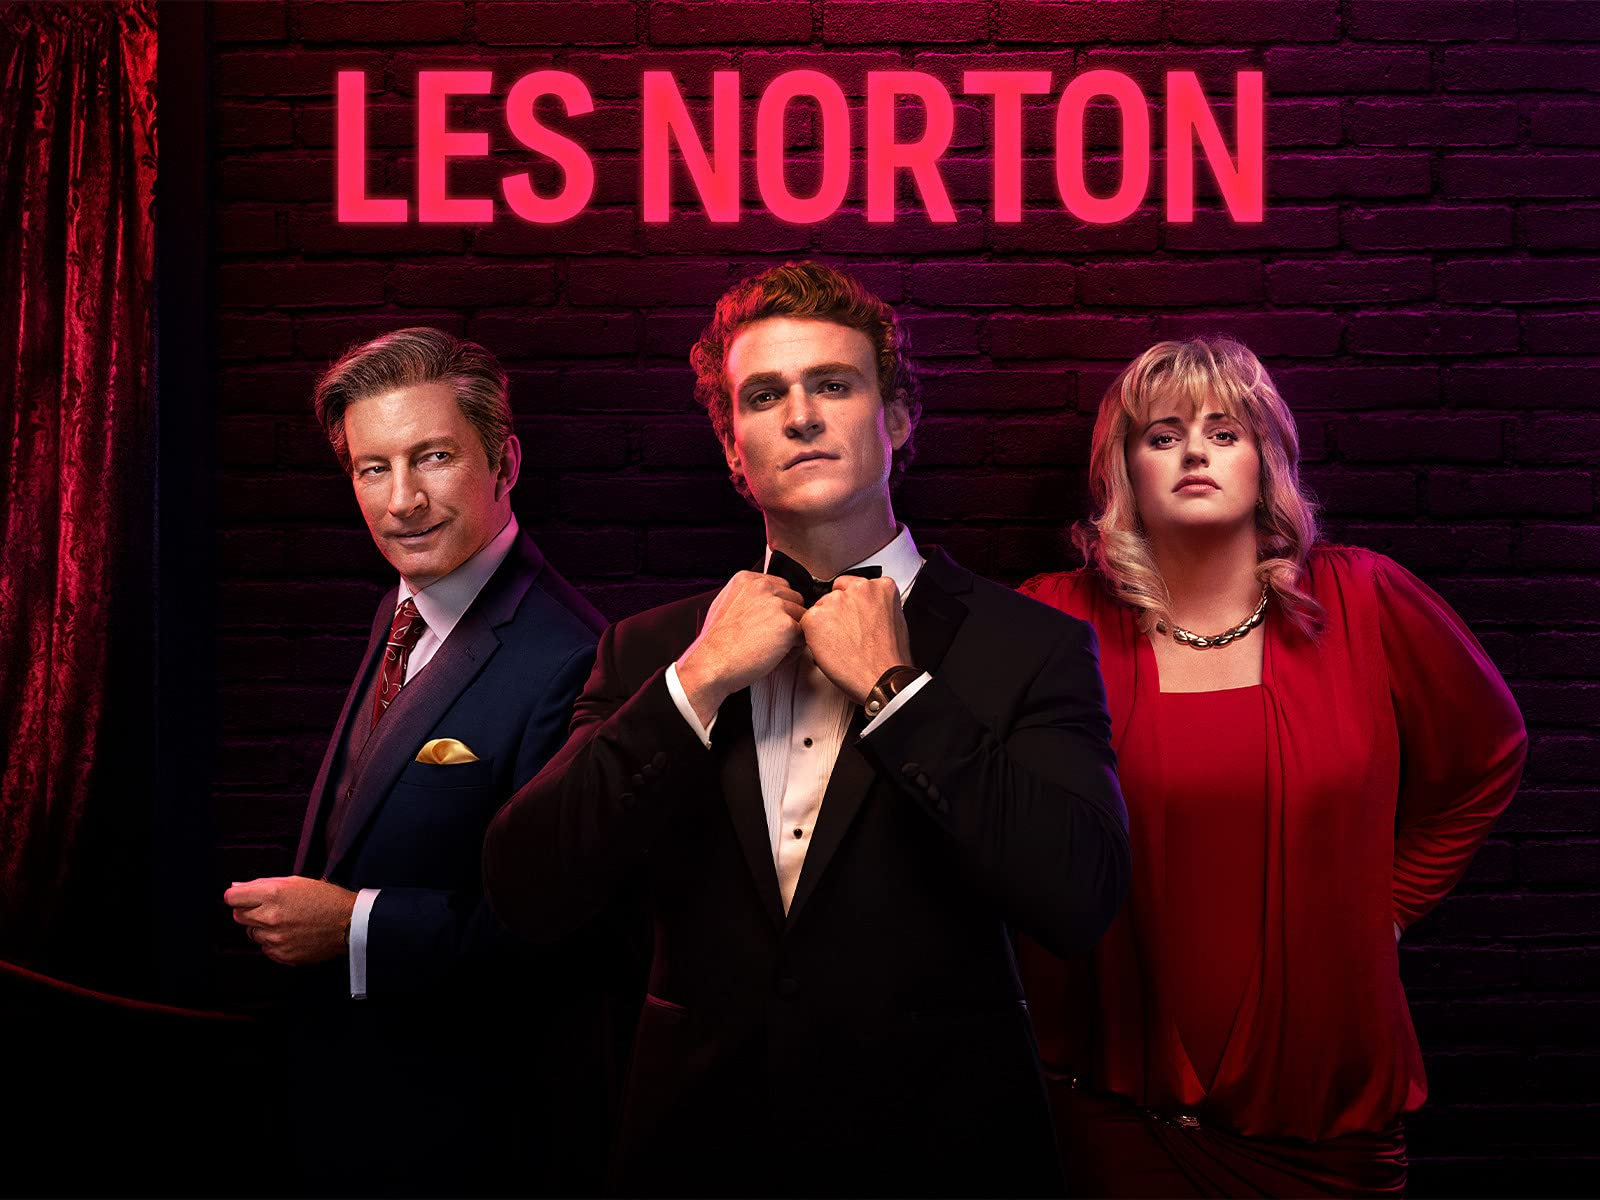 Les Norton on Amazon Prime Video UK